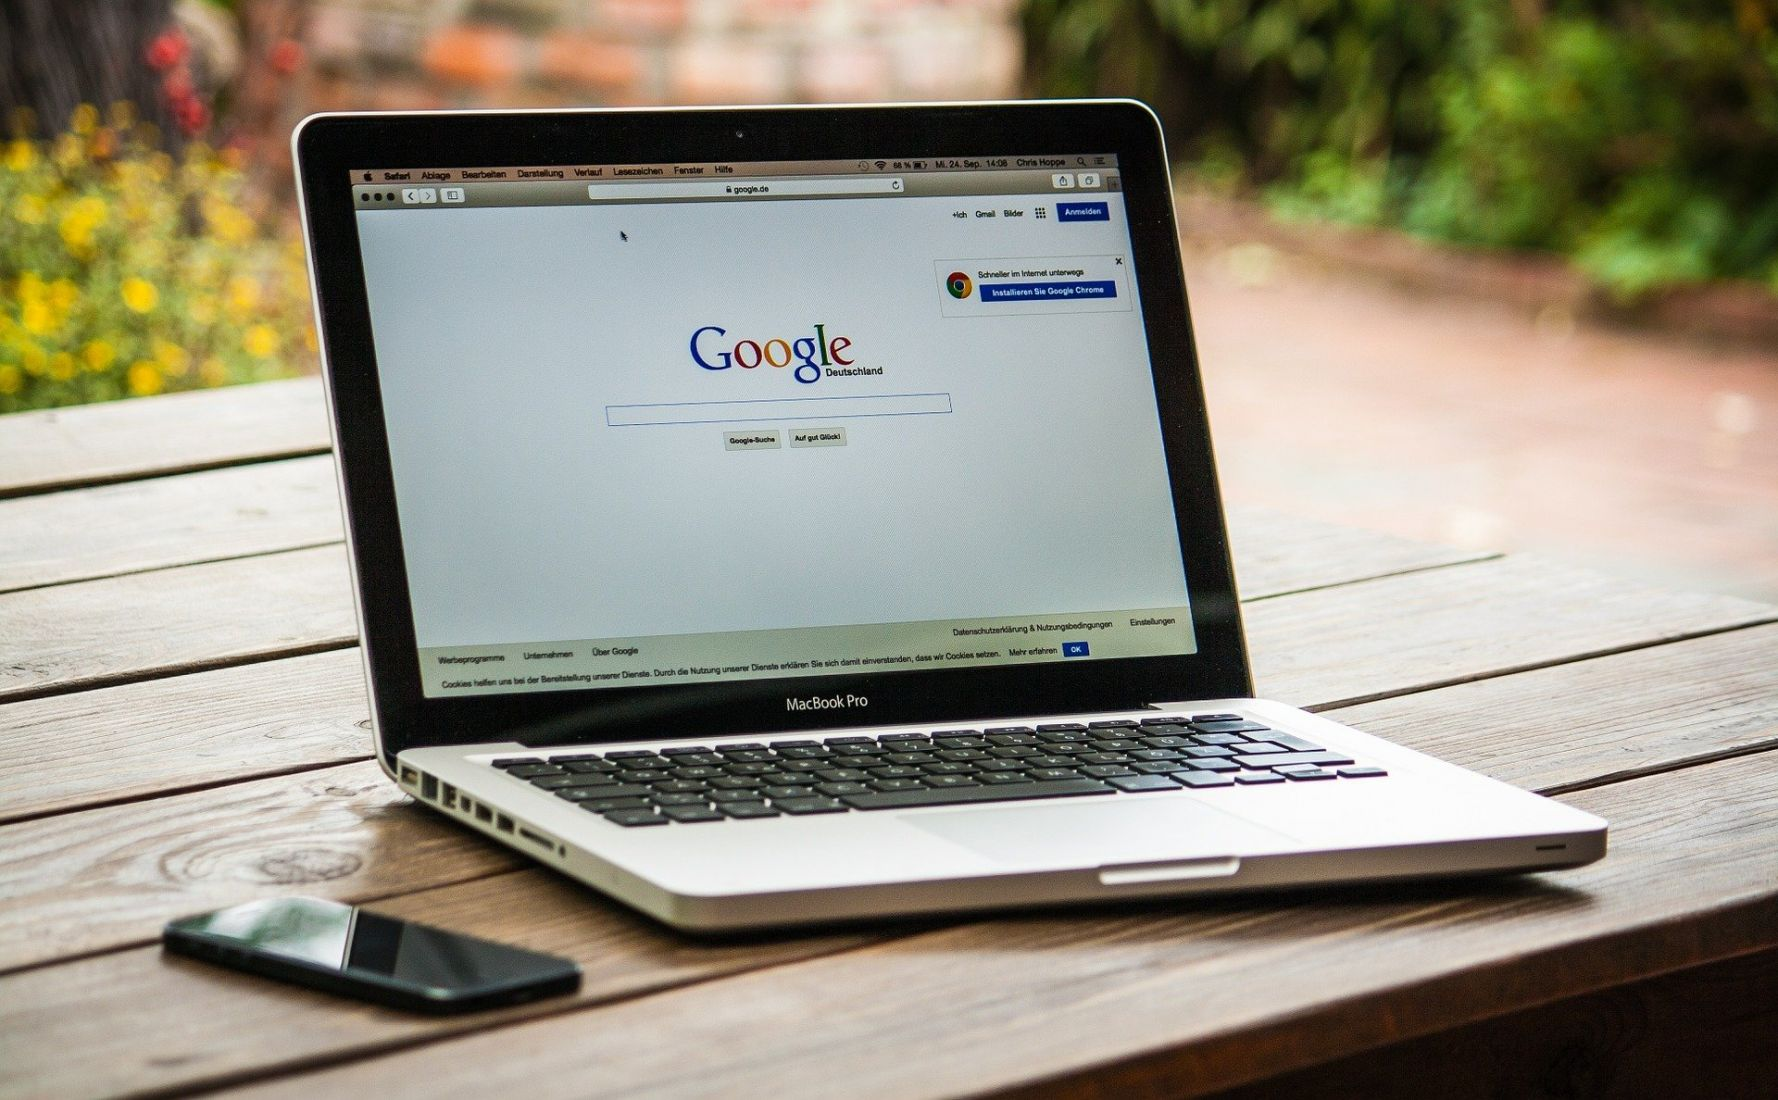 Laman Google Dalam Sebuah Laptop. Google Mengancam akan Keluar dari Pasar Australia.